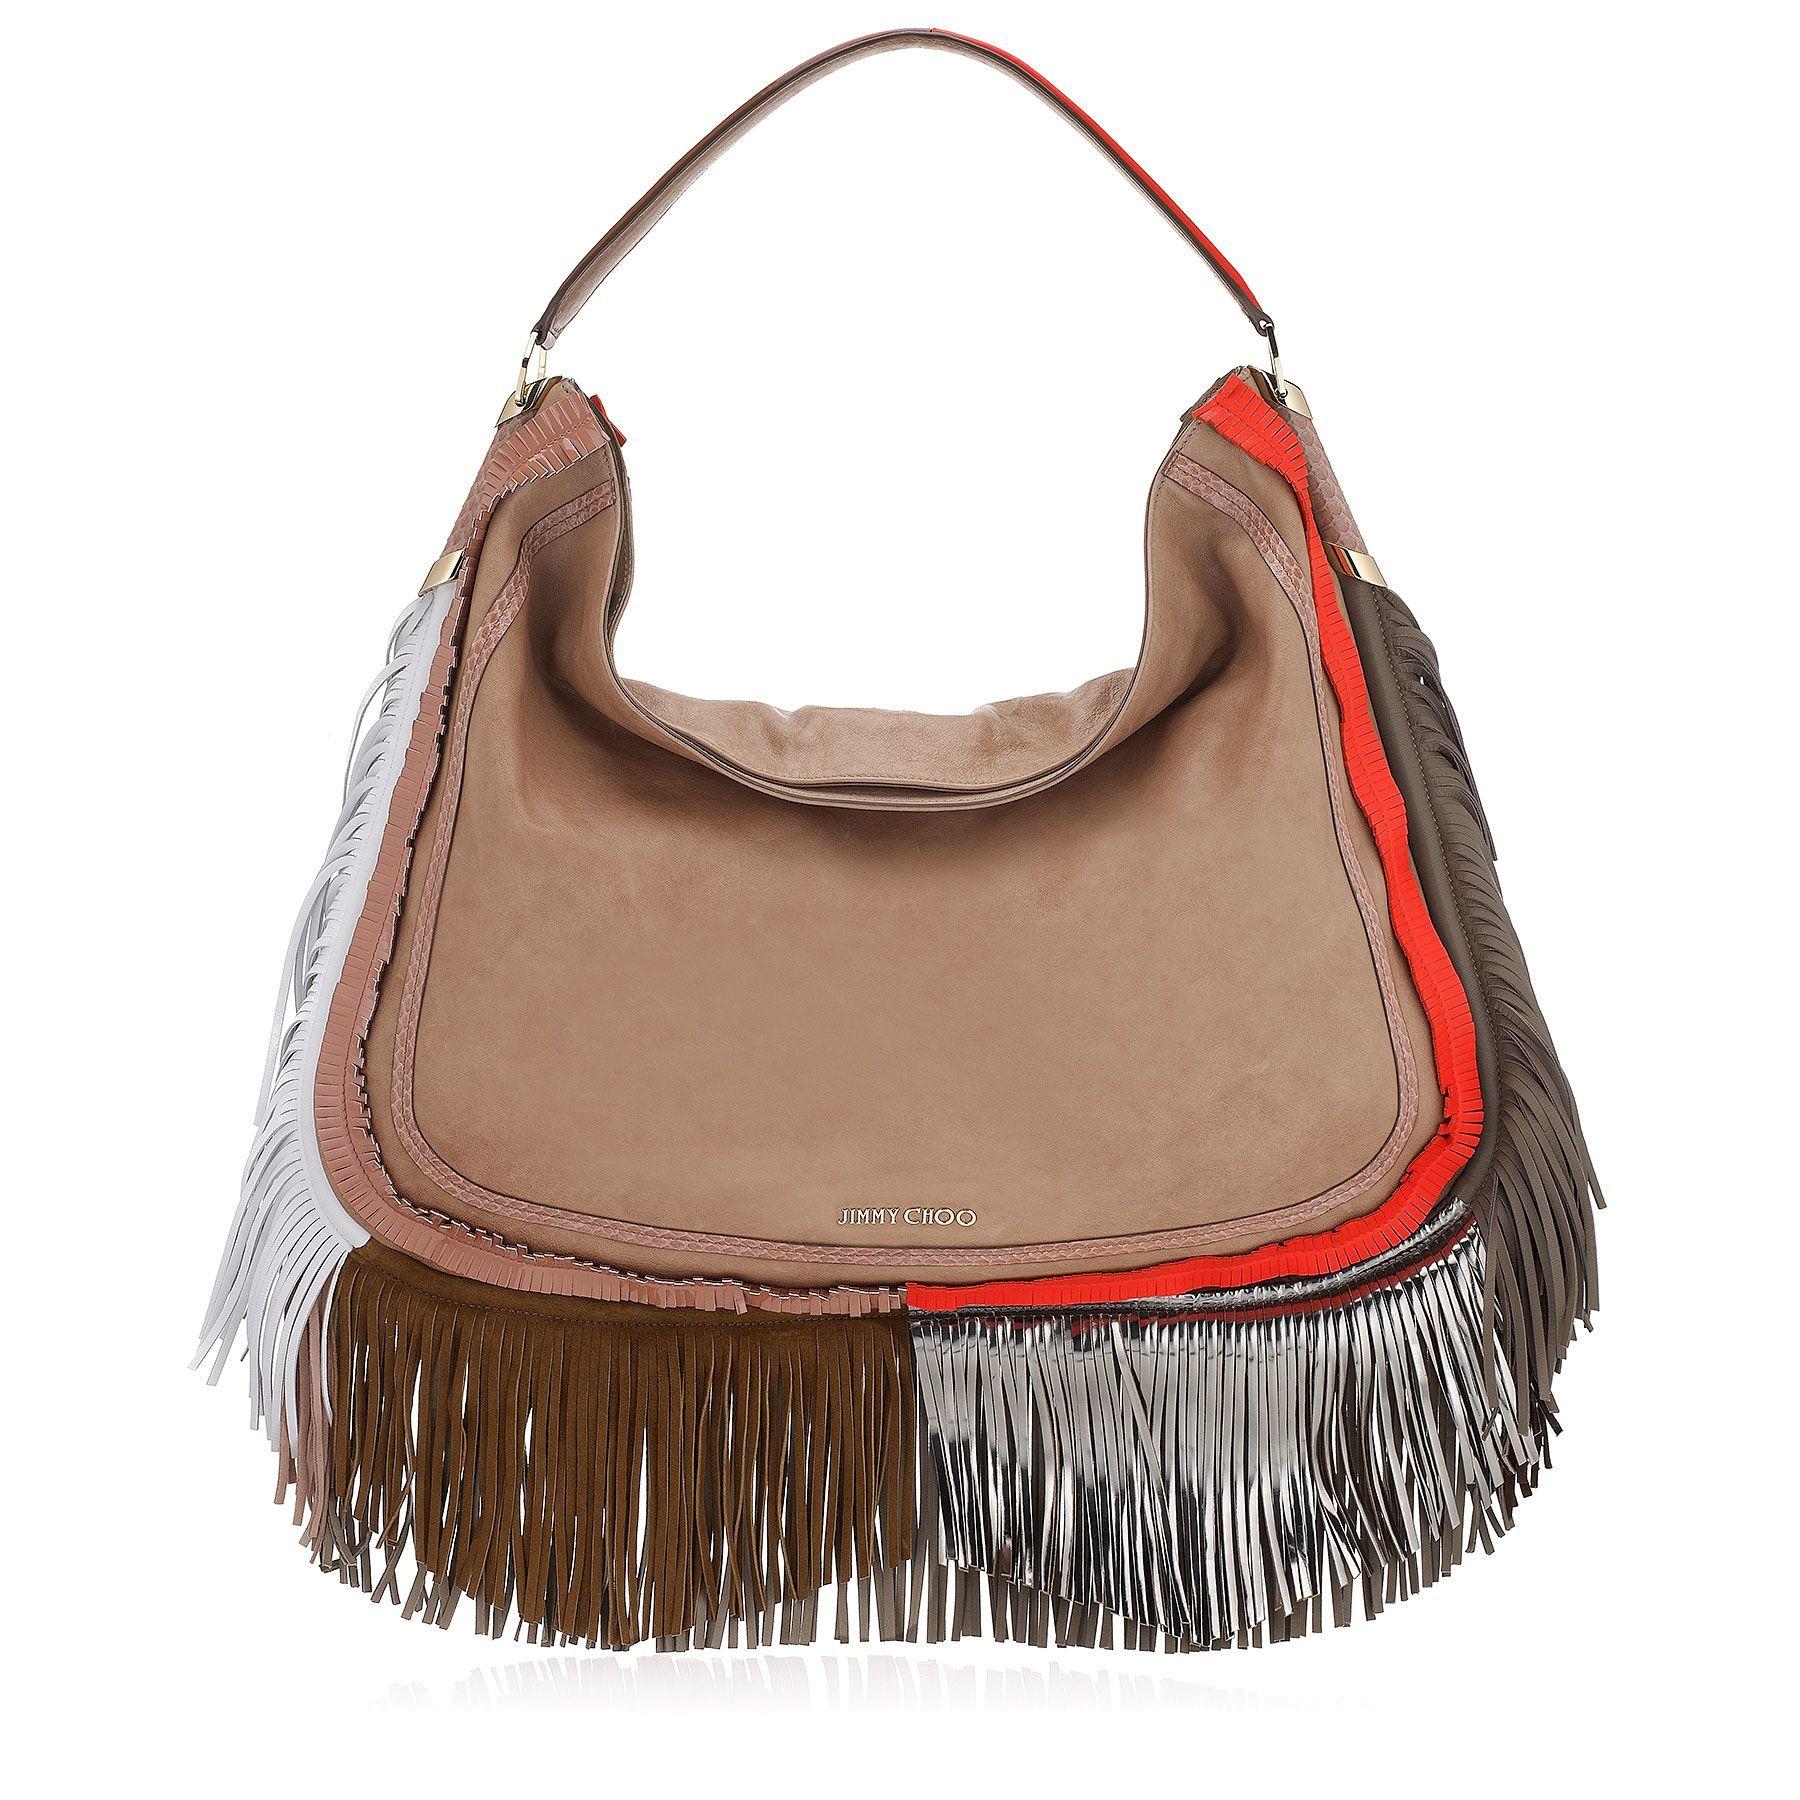 Jimmy Choo Zoe Bag - Terracotta Mix Satin Leather with Mixed Fringe and Elaphe Shoulder Bag